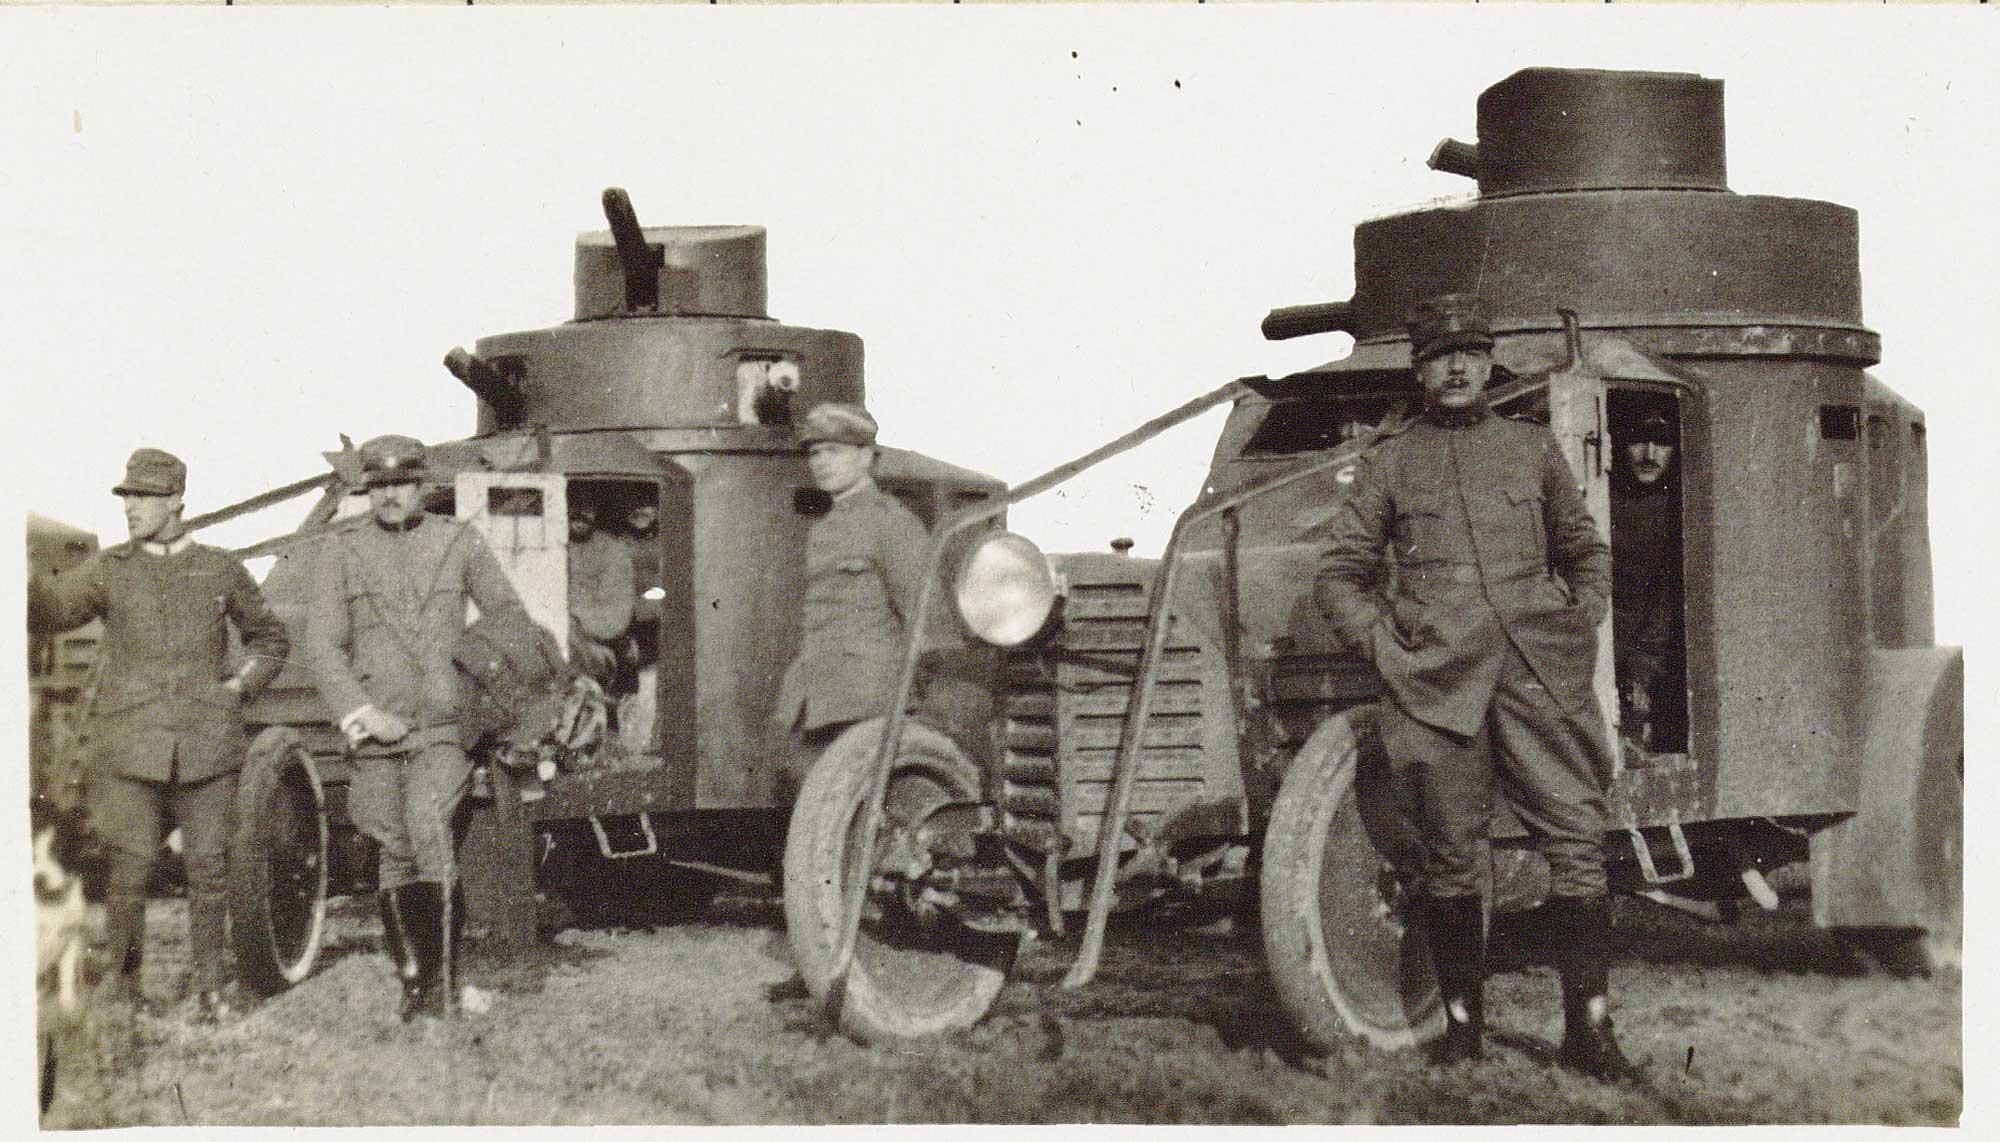 Armoured motor vehicles in Gorizia, 1916.